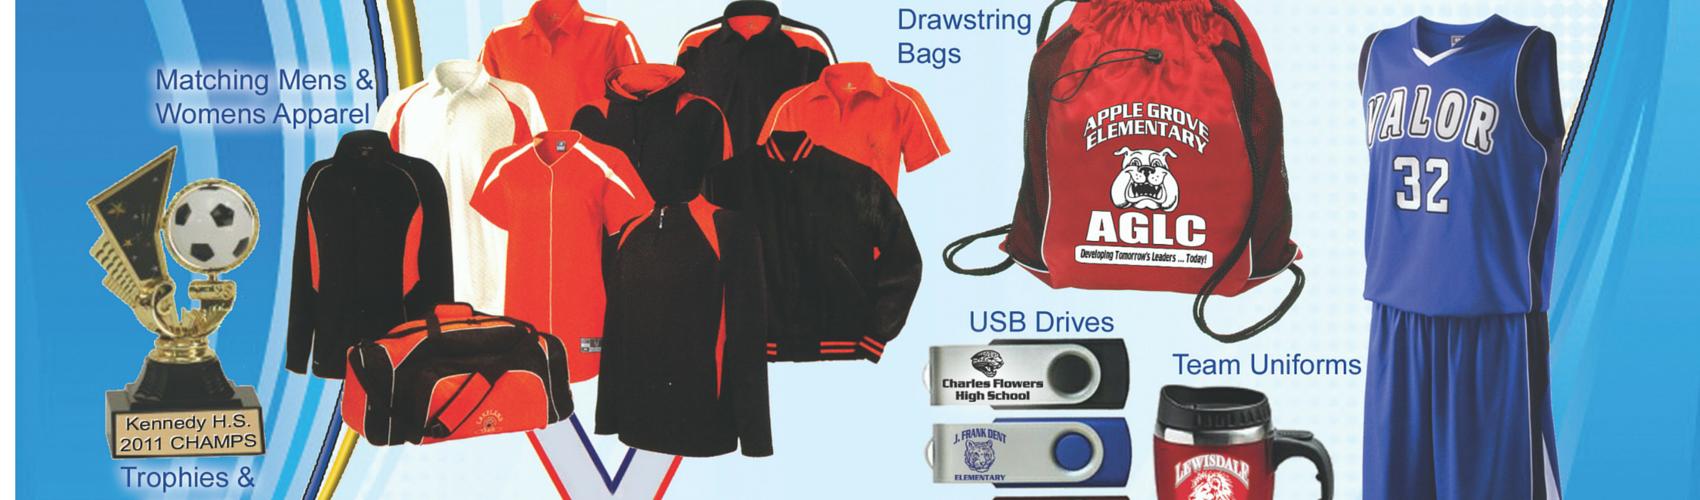 School Promotional items custom imprinted